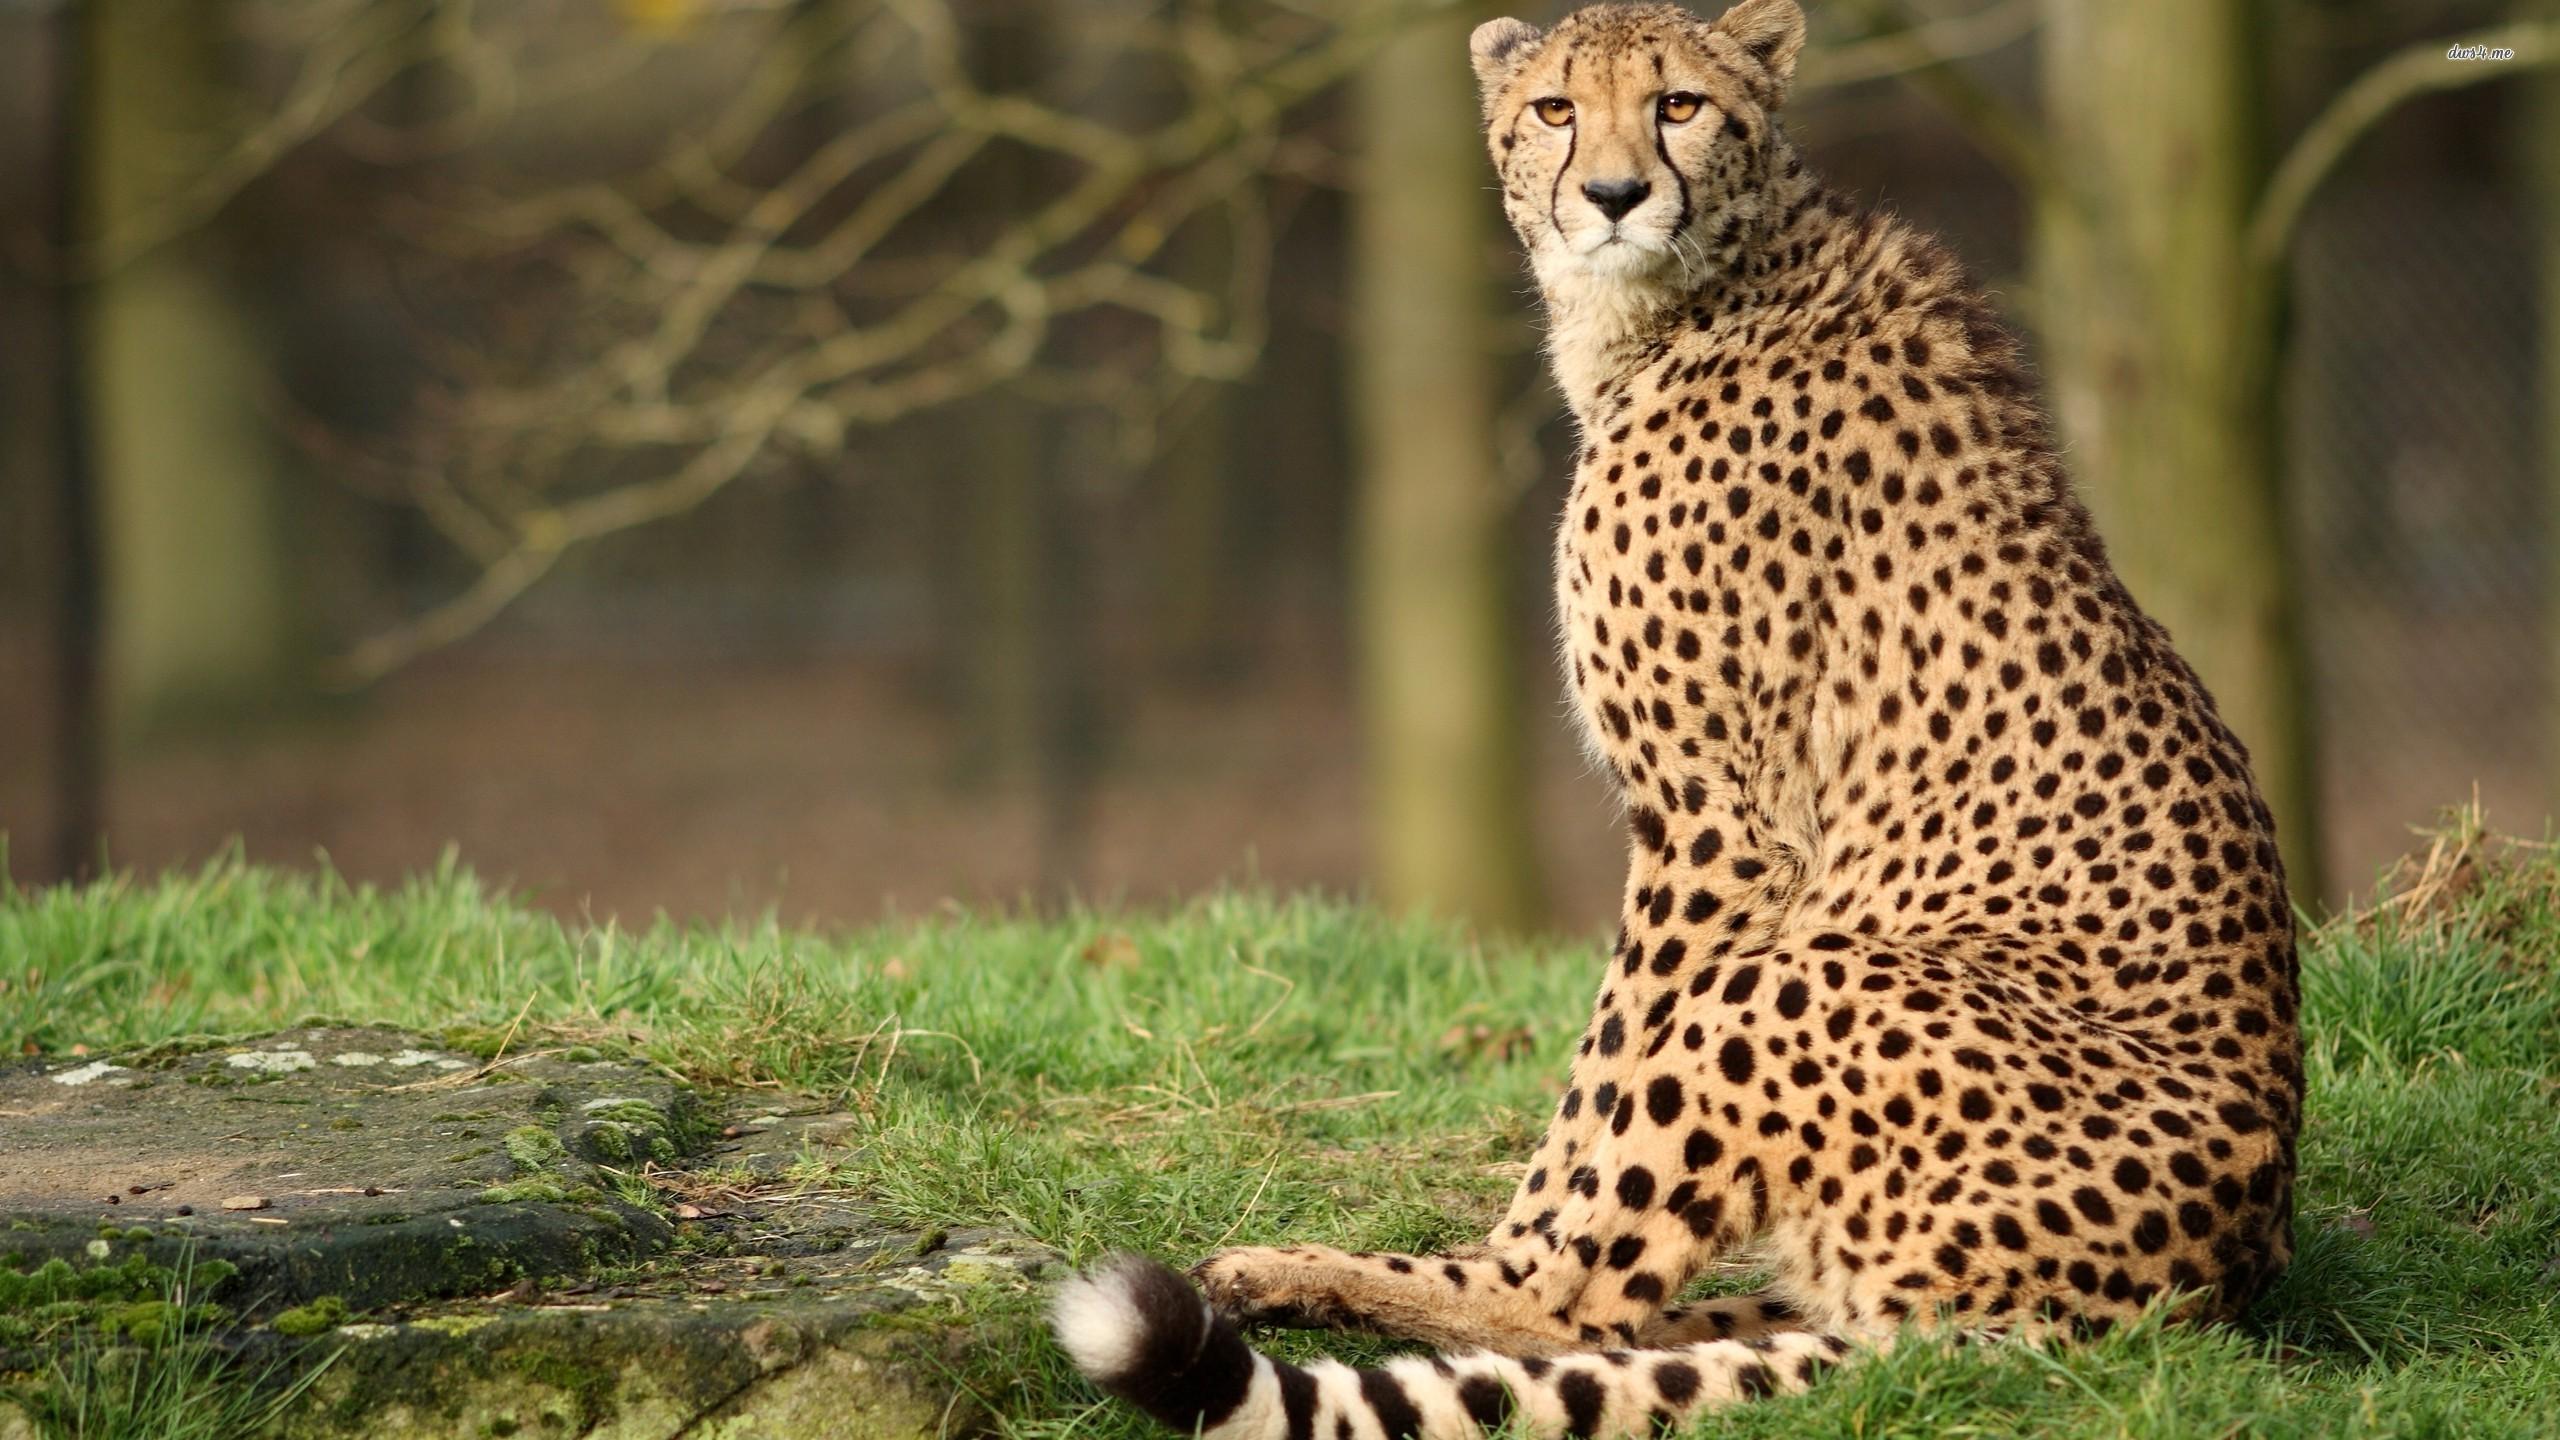 Res: 2560x1440, ... Cheetah wallpaper  ...